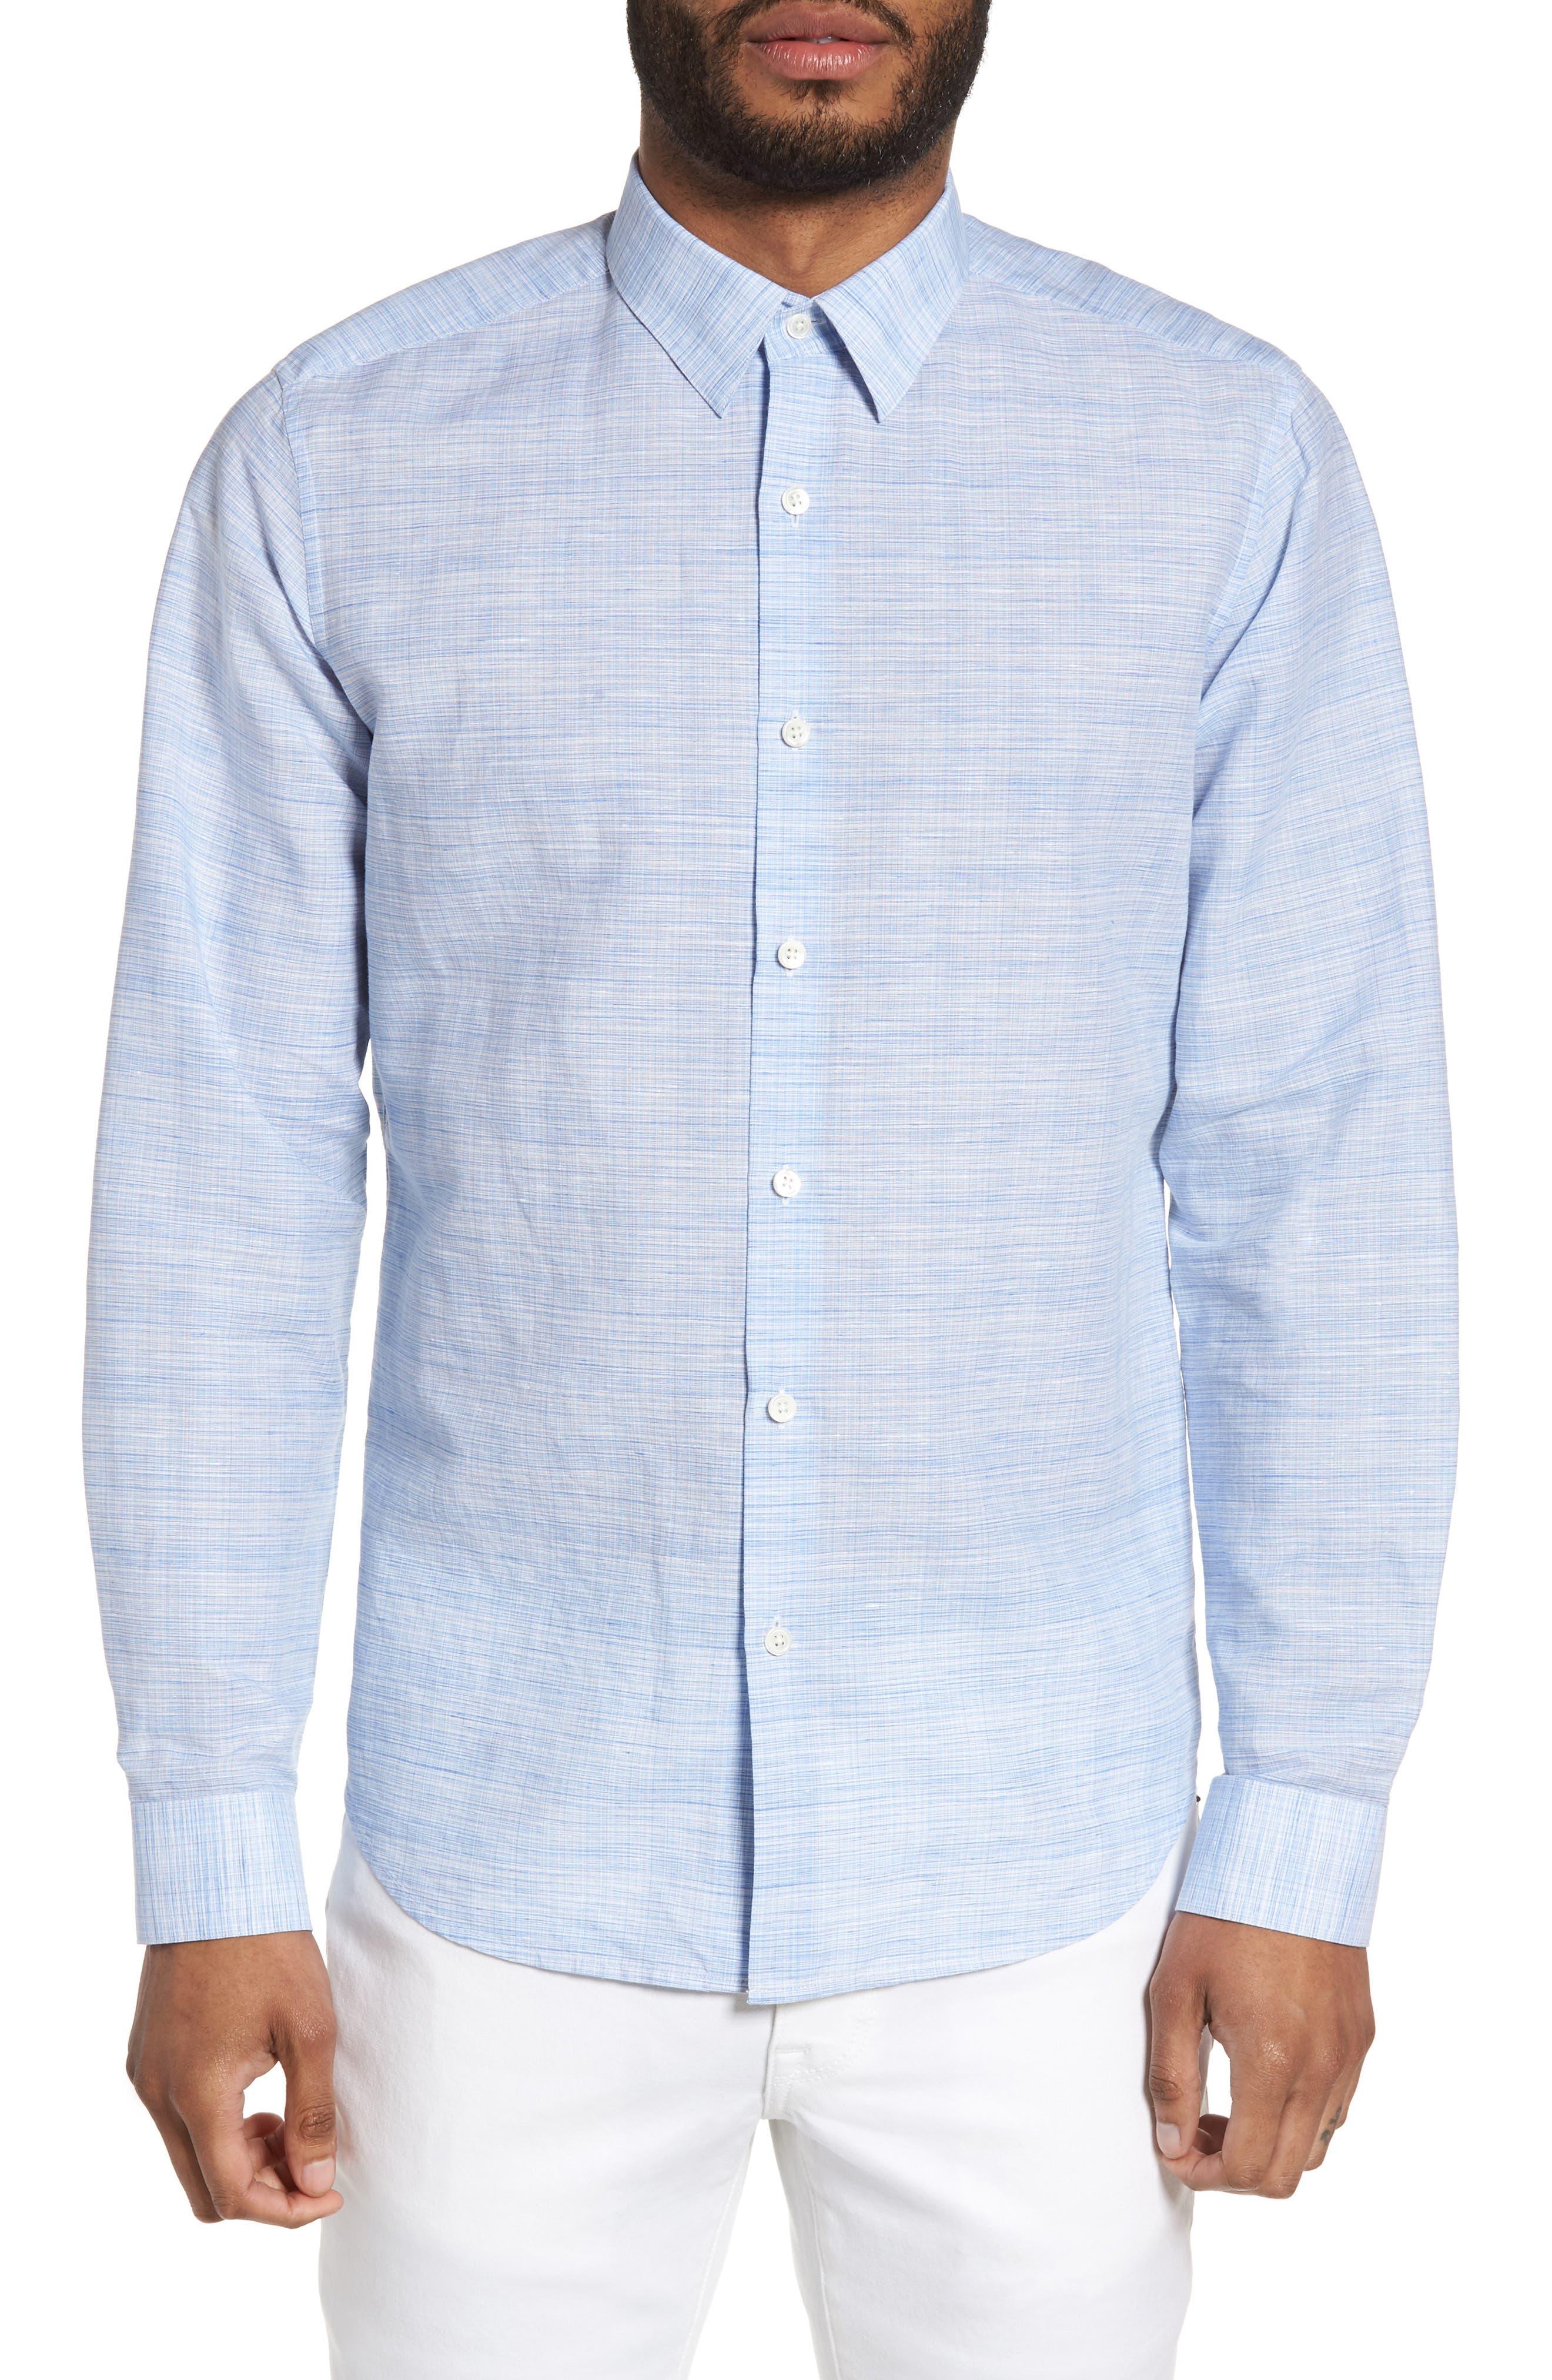 Theory Sylvain Dashed Trim Fit Linen Blend Sport Shirt